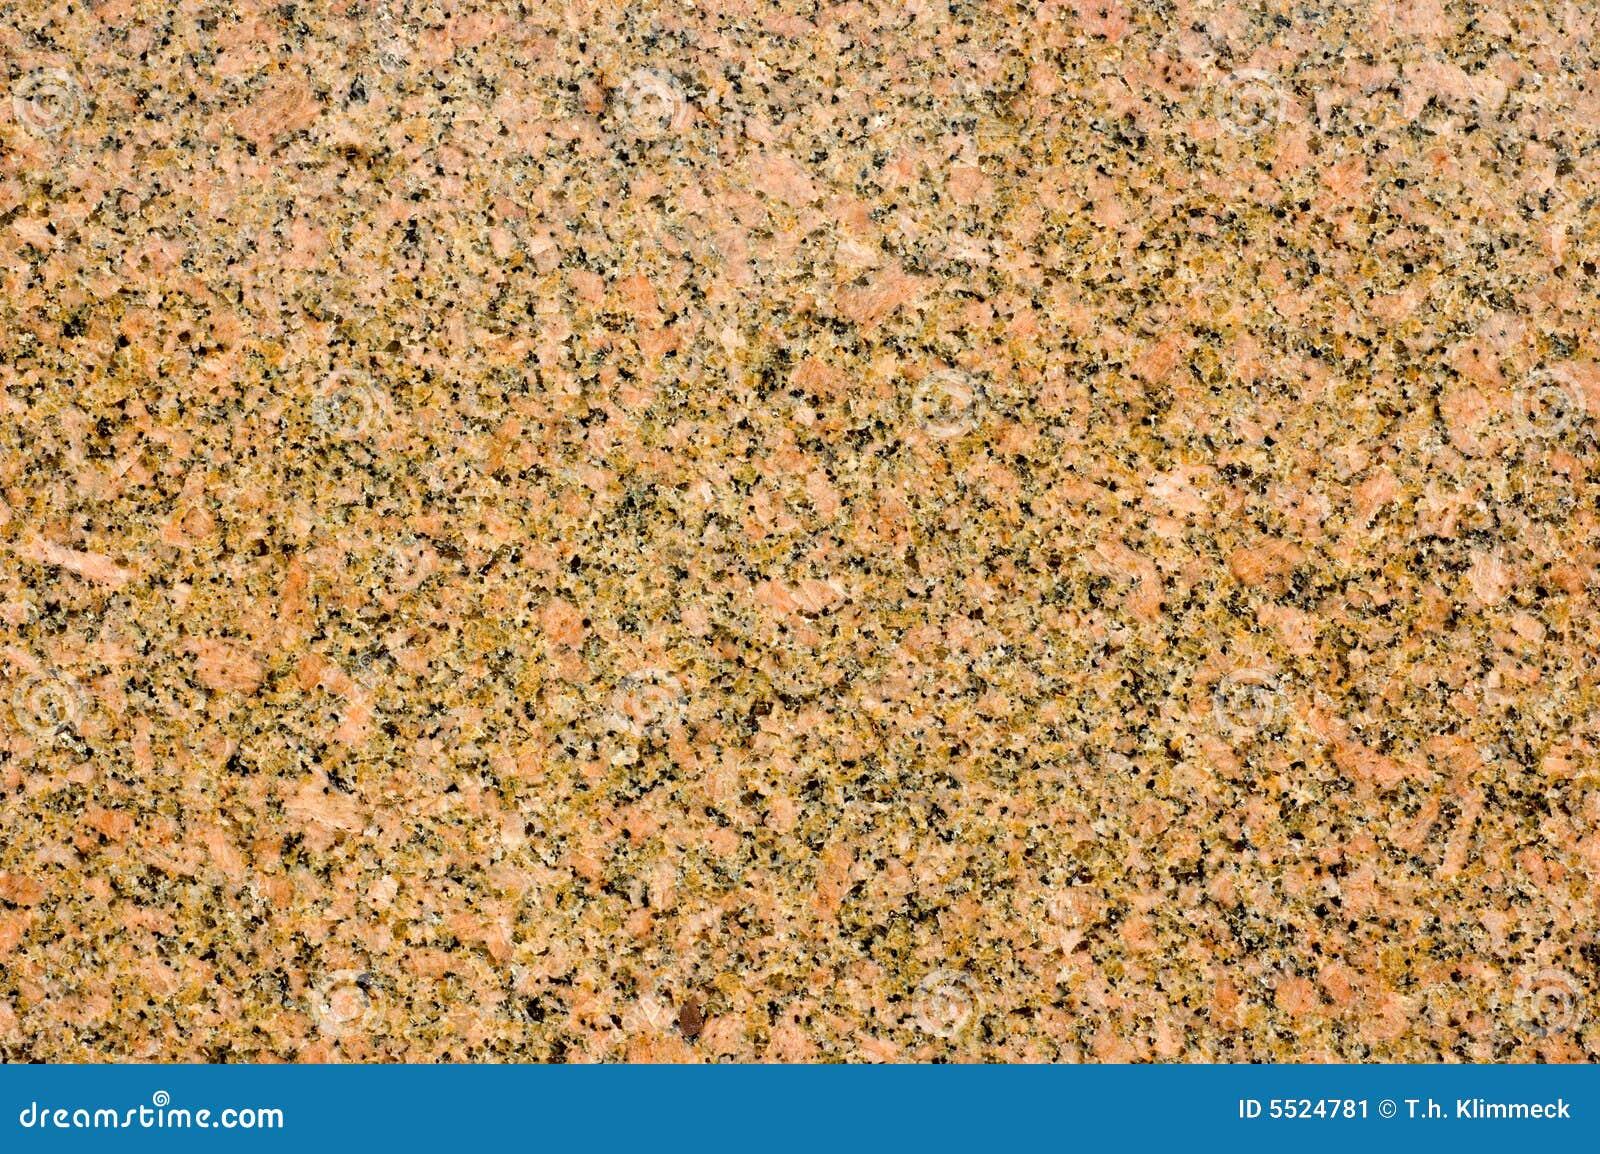 roter granit stockbild bild von hart granit nahaufnahmen 5524781. Black Bedroom Furniture Sets. Home Design Ideas